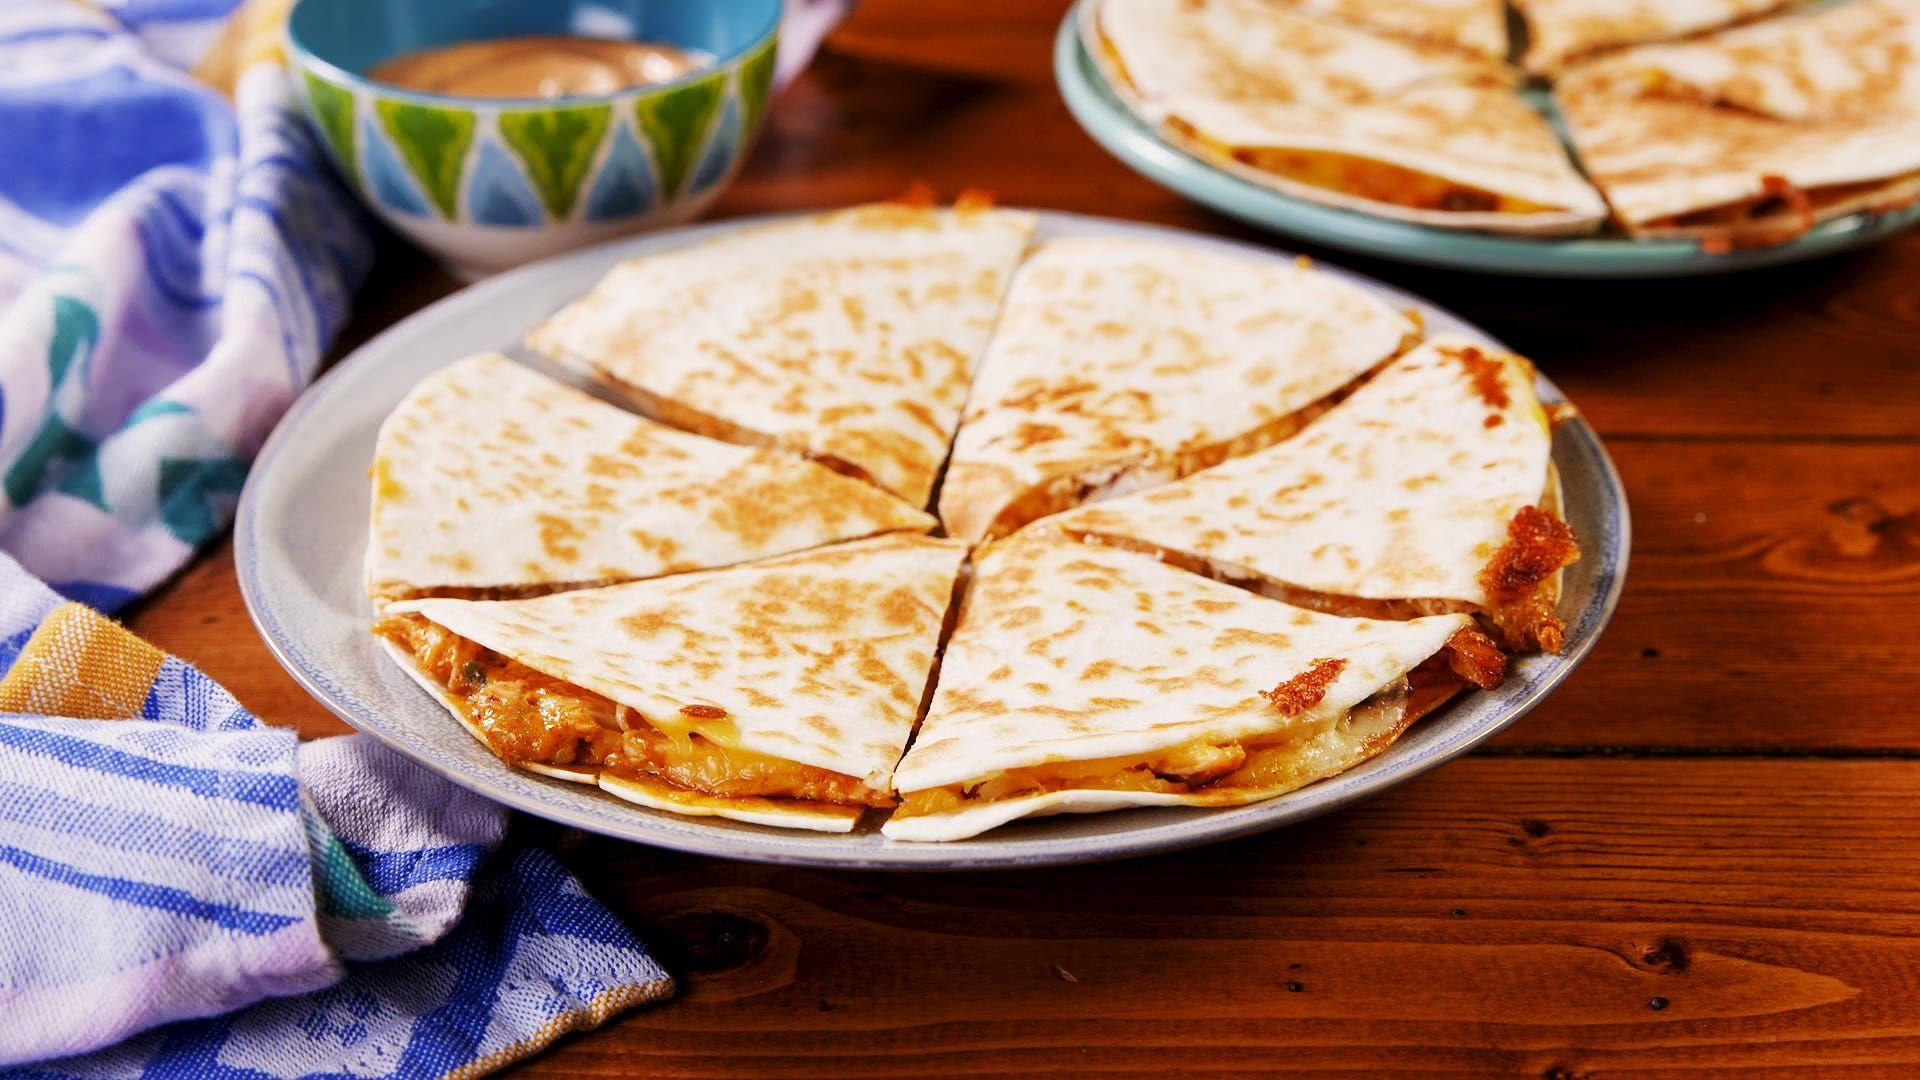 Best Copycat Taco Bell Quesadilla Recipe  How to Make